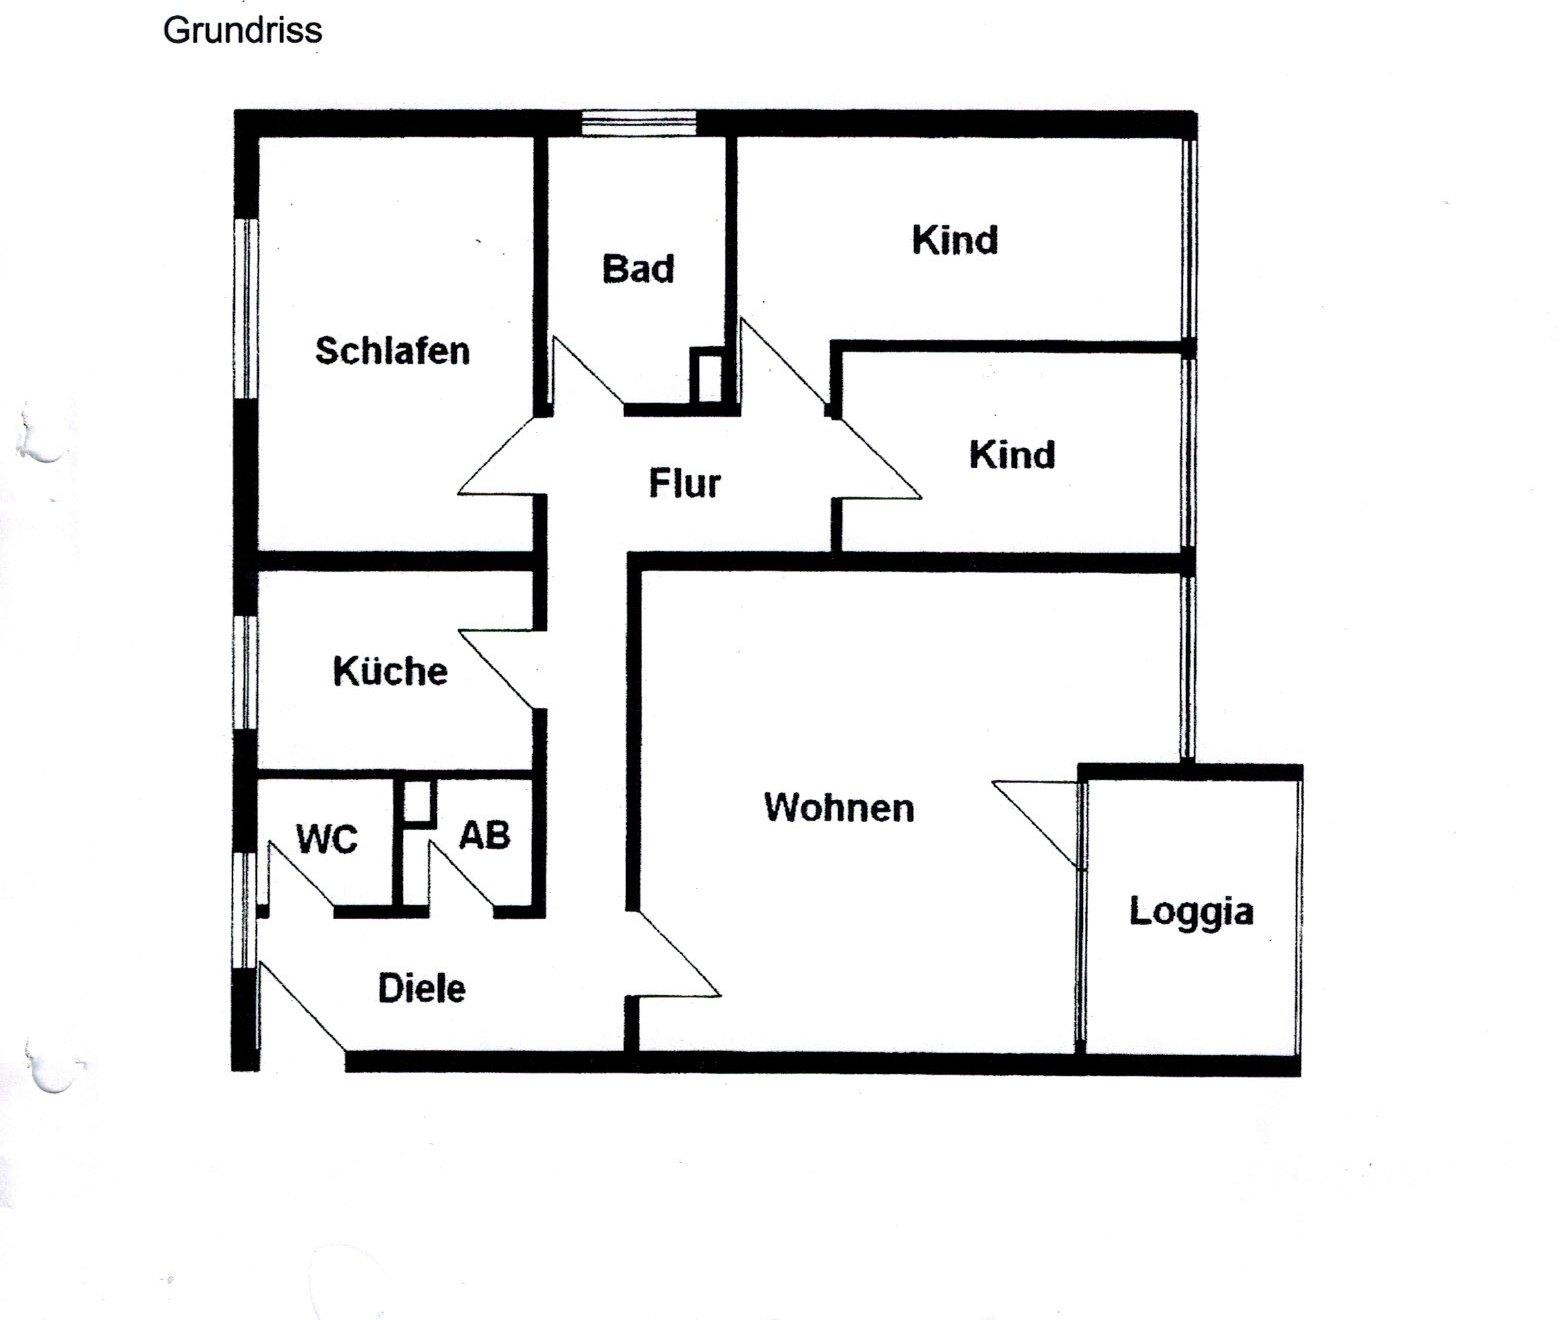 Grundriss1